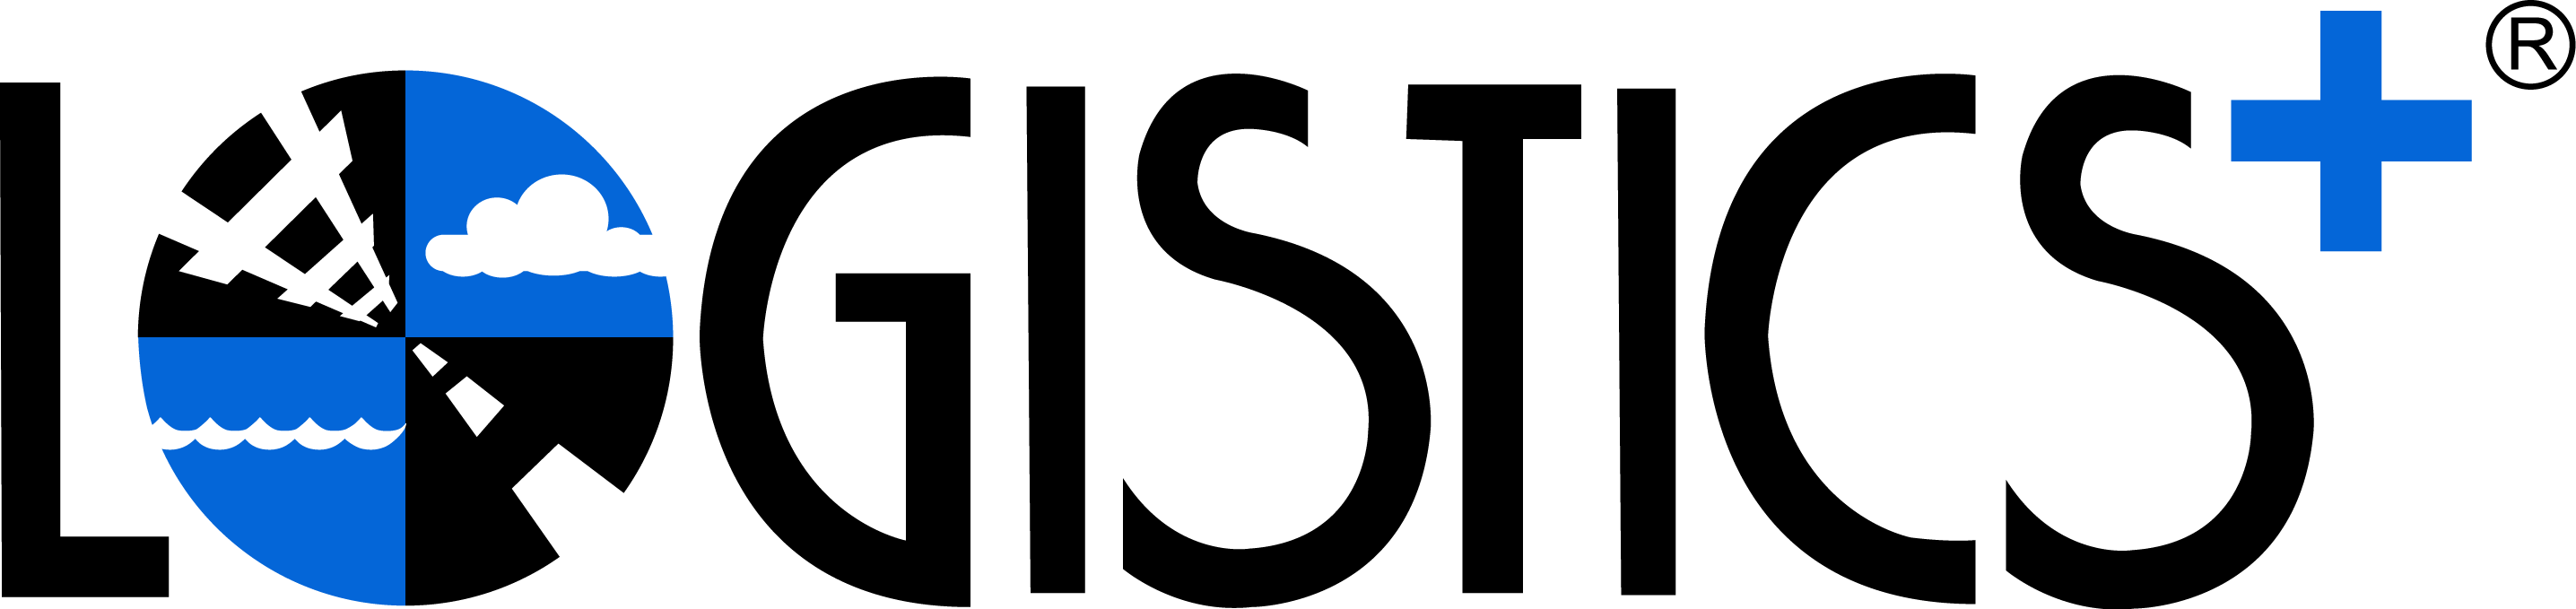 Logistics Plus Logo - only